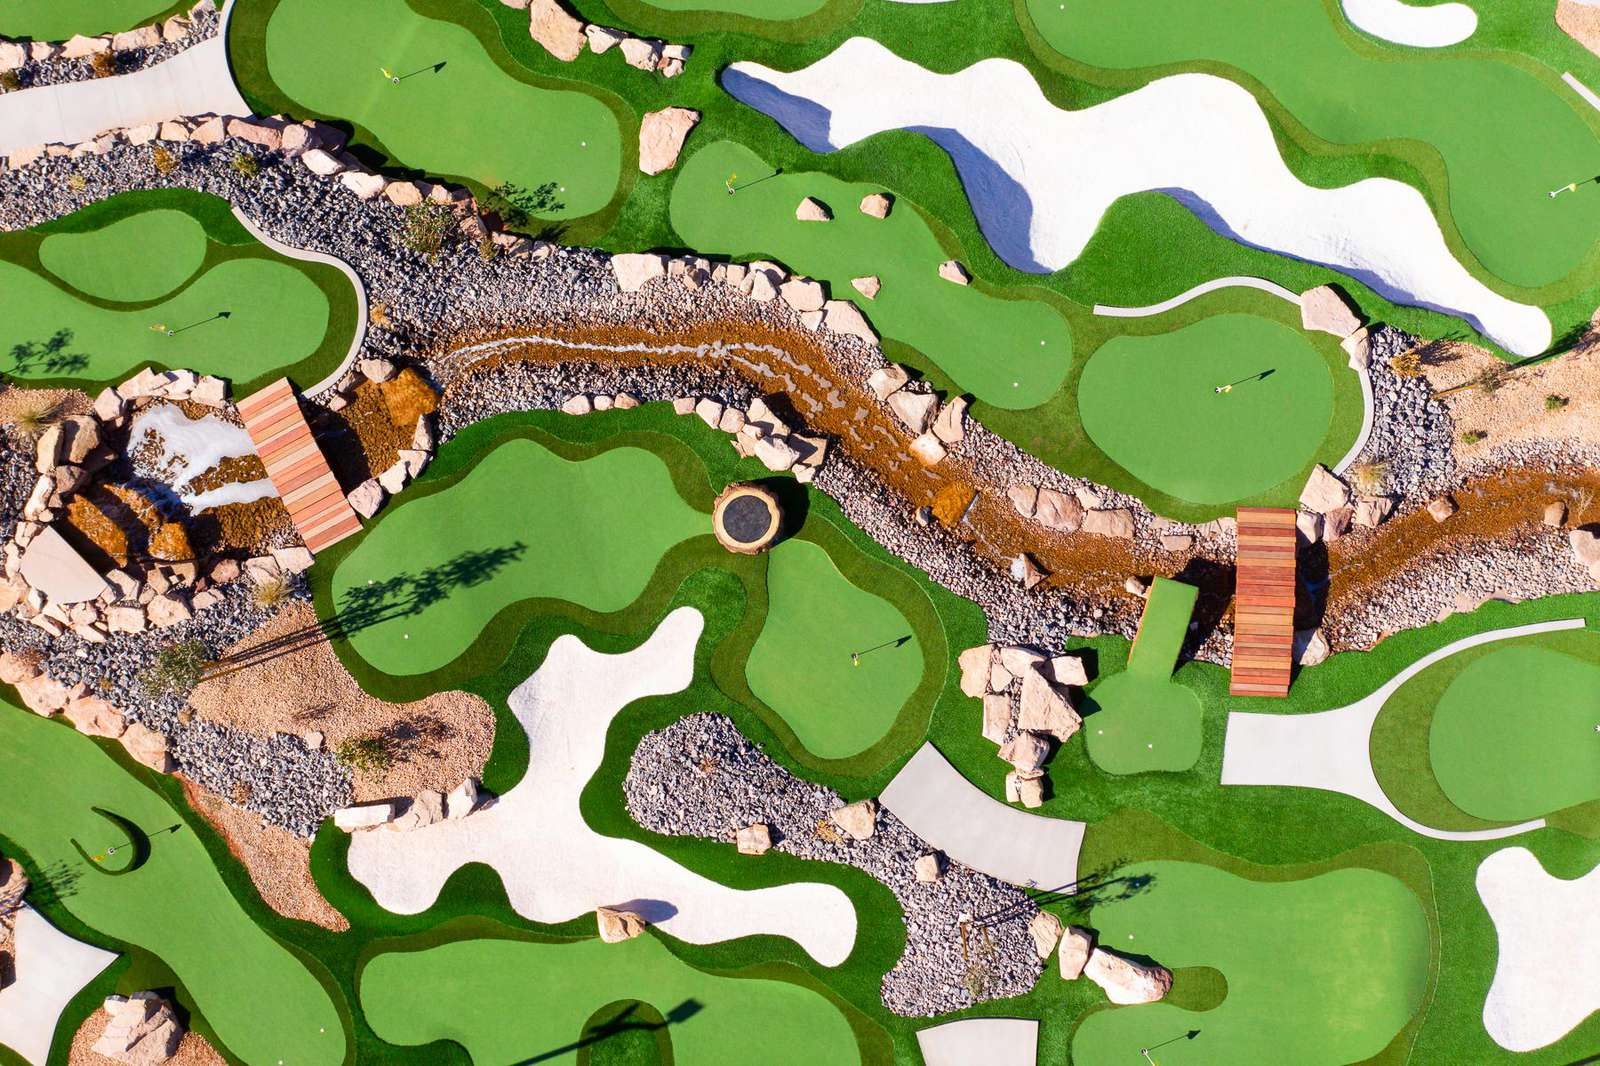 Mini golf competition course